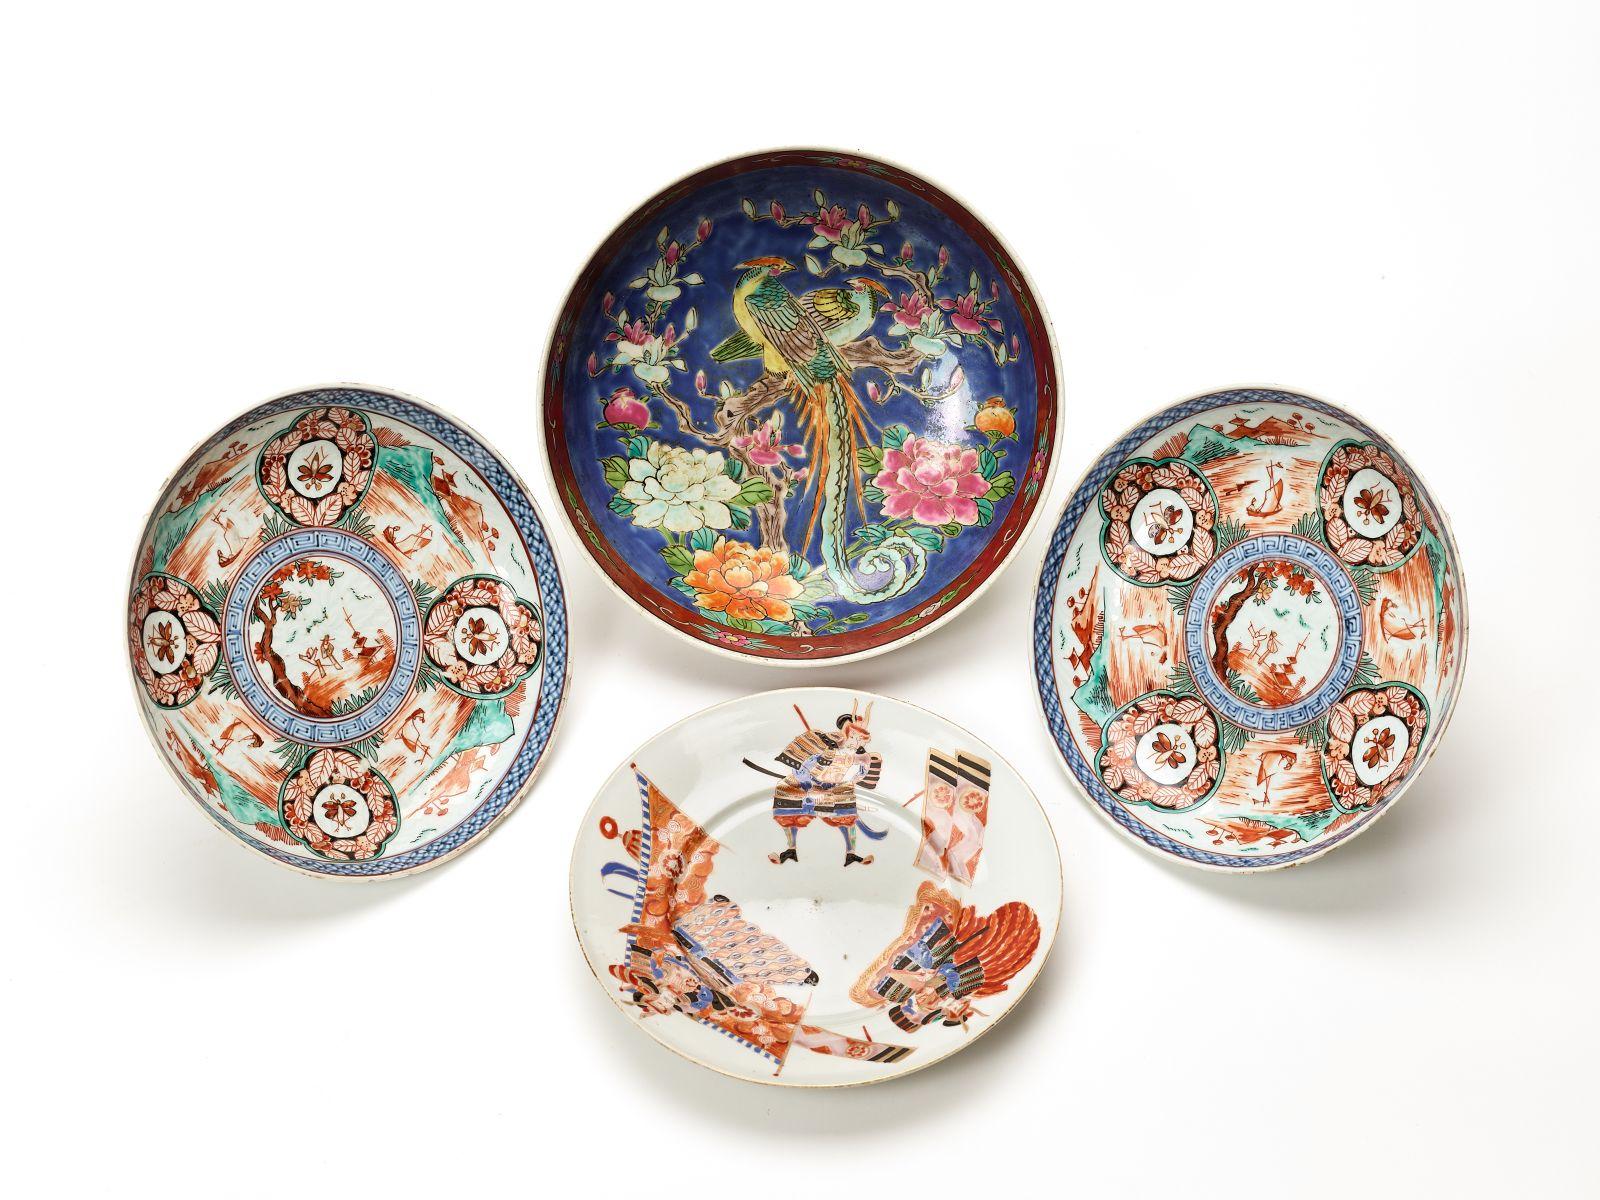 #189 Four Japanese porcelain plates and bowls | Vier japanische Porzellanteller und Schalen Image